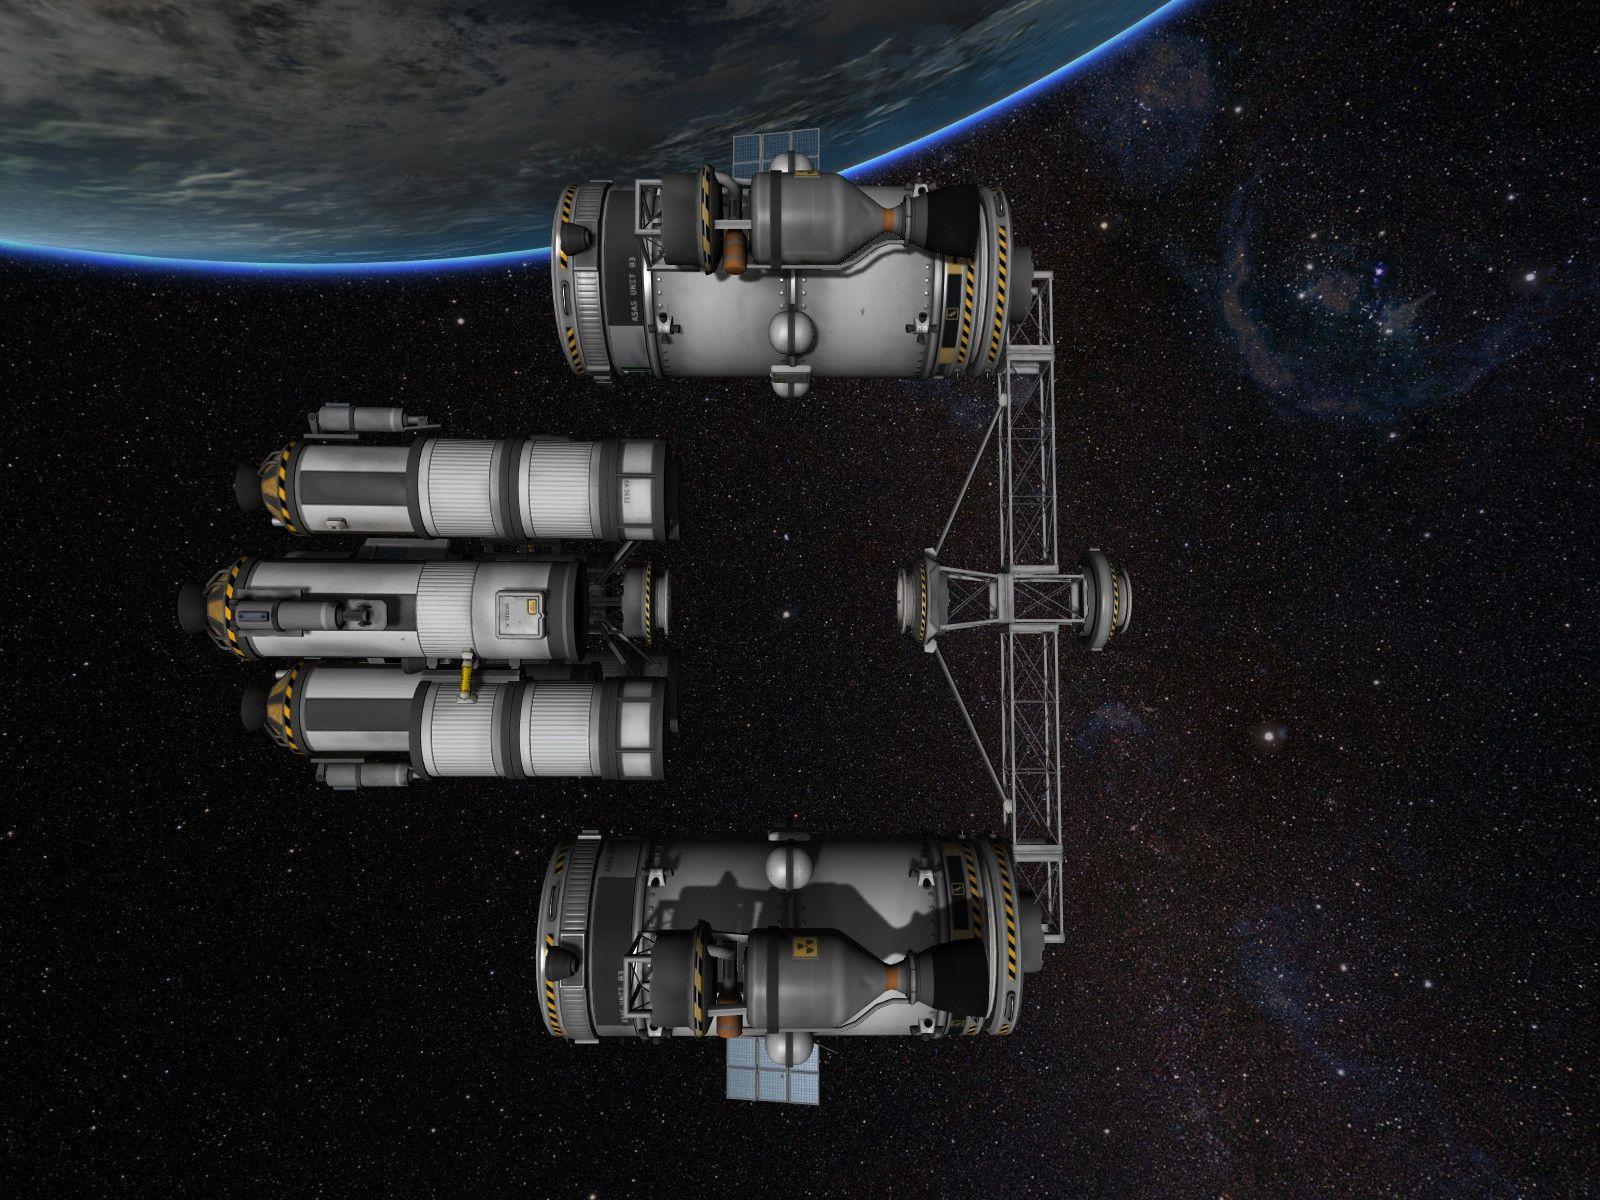 ksp space shuttle challenger - photo #8